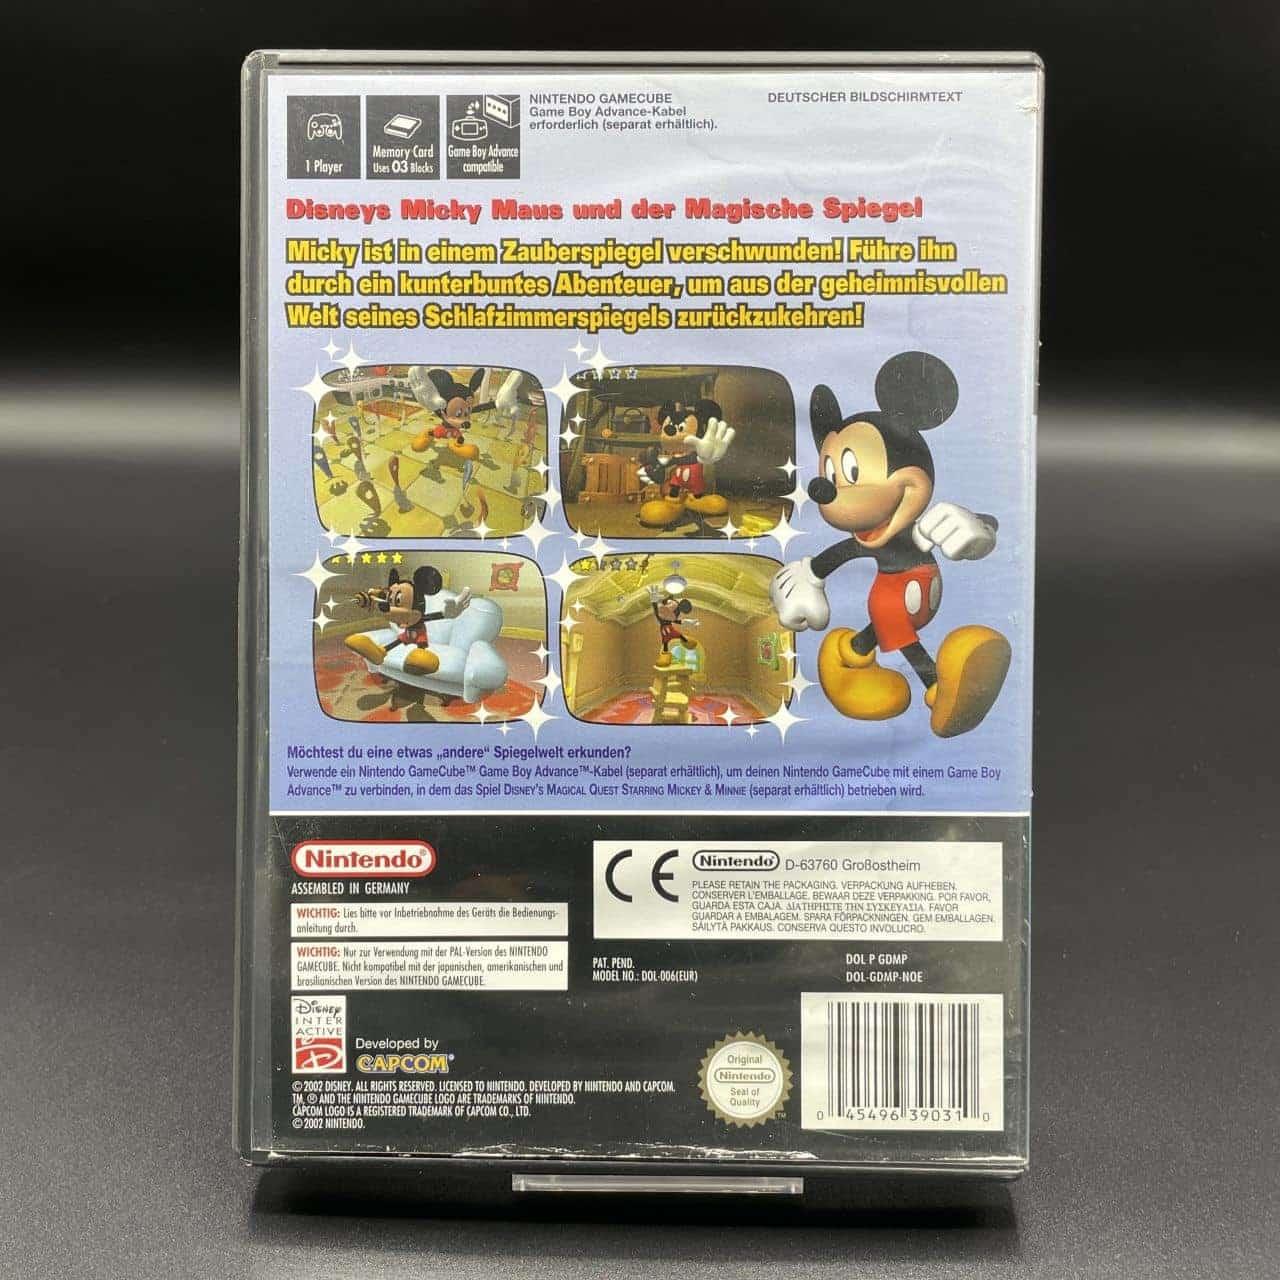 GC Disney's Magical Mirror Starring Mickey Mouse (Komplett) (Gebrauchsspuren) GameCube